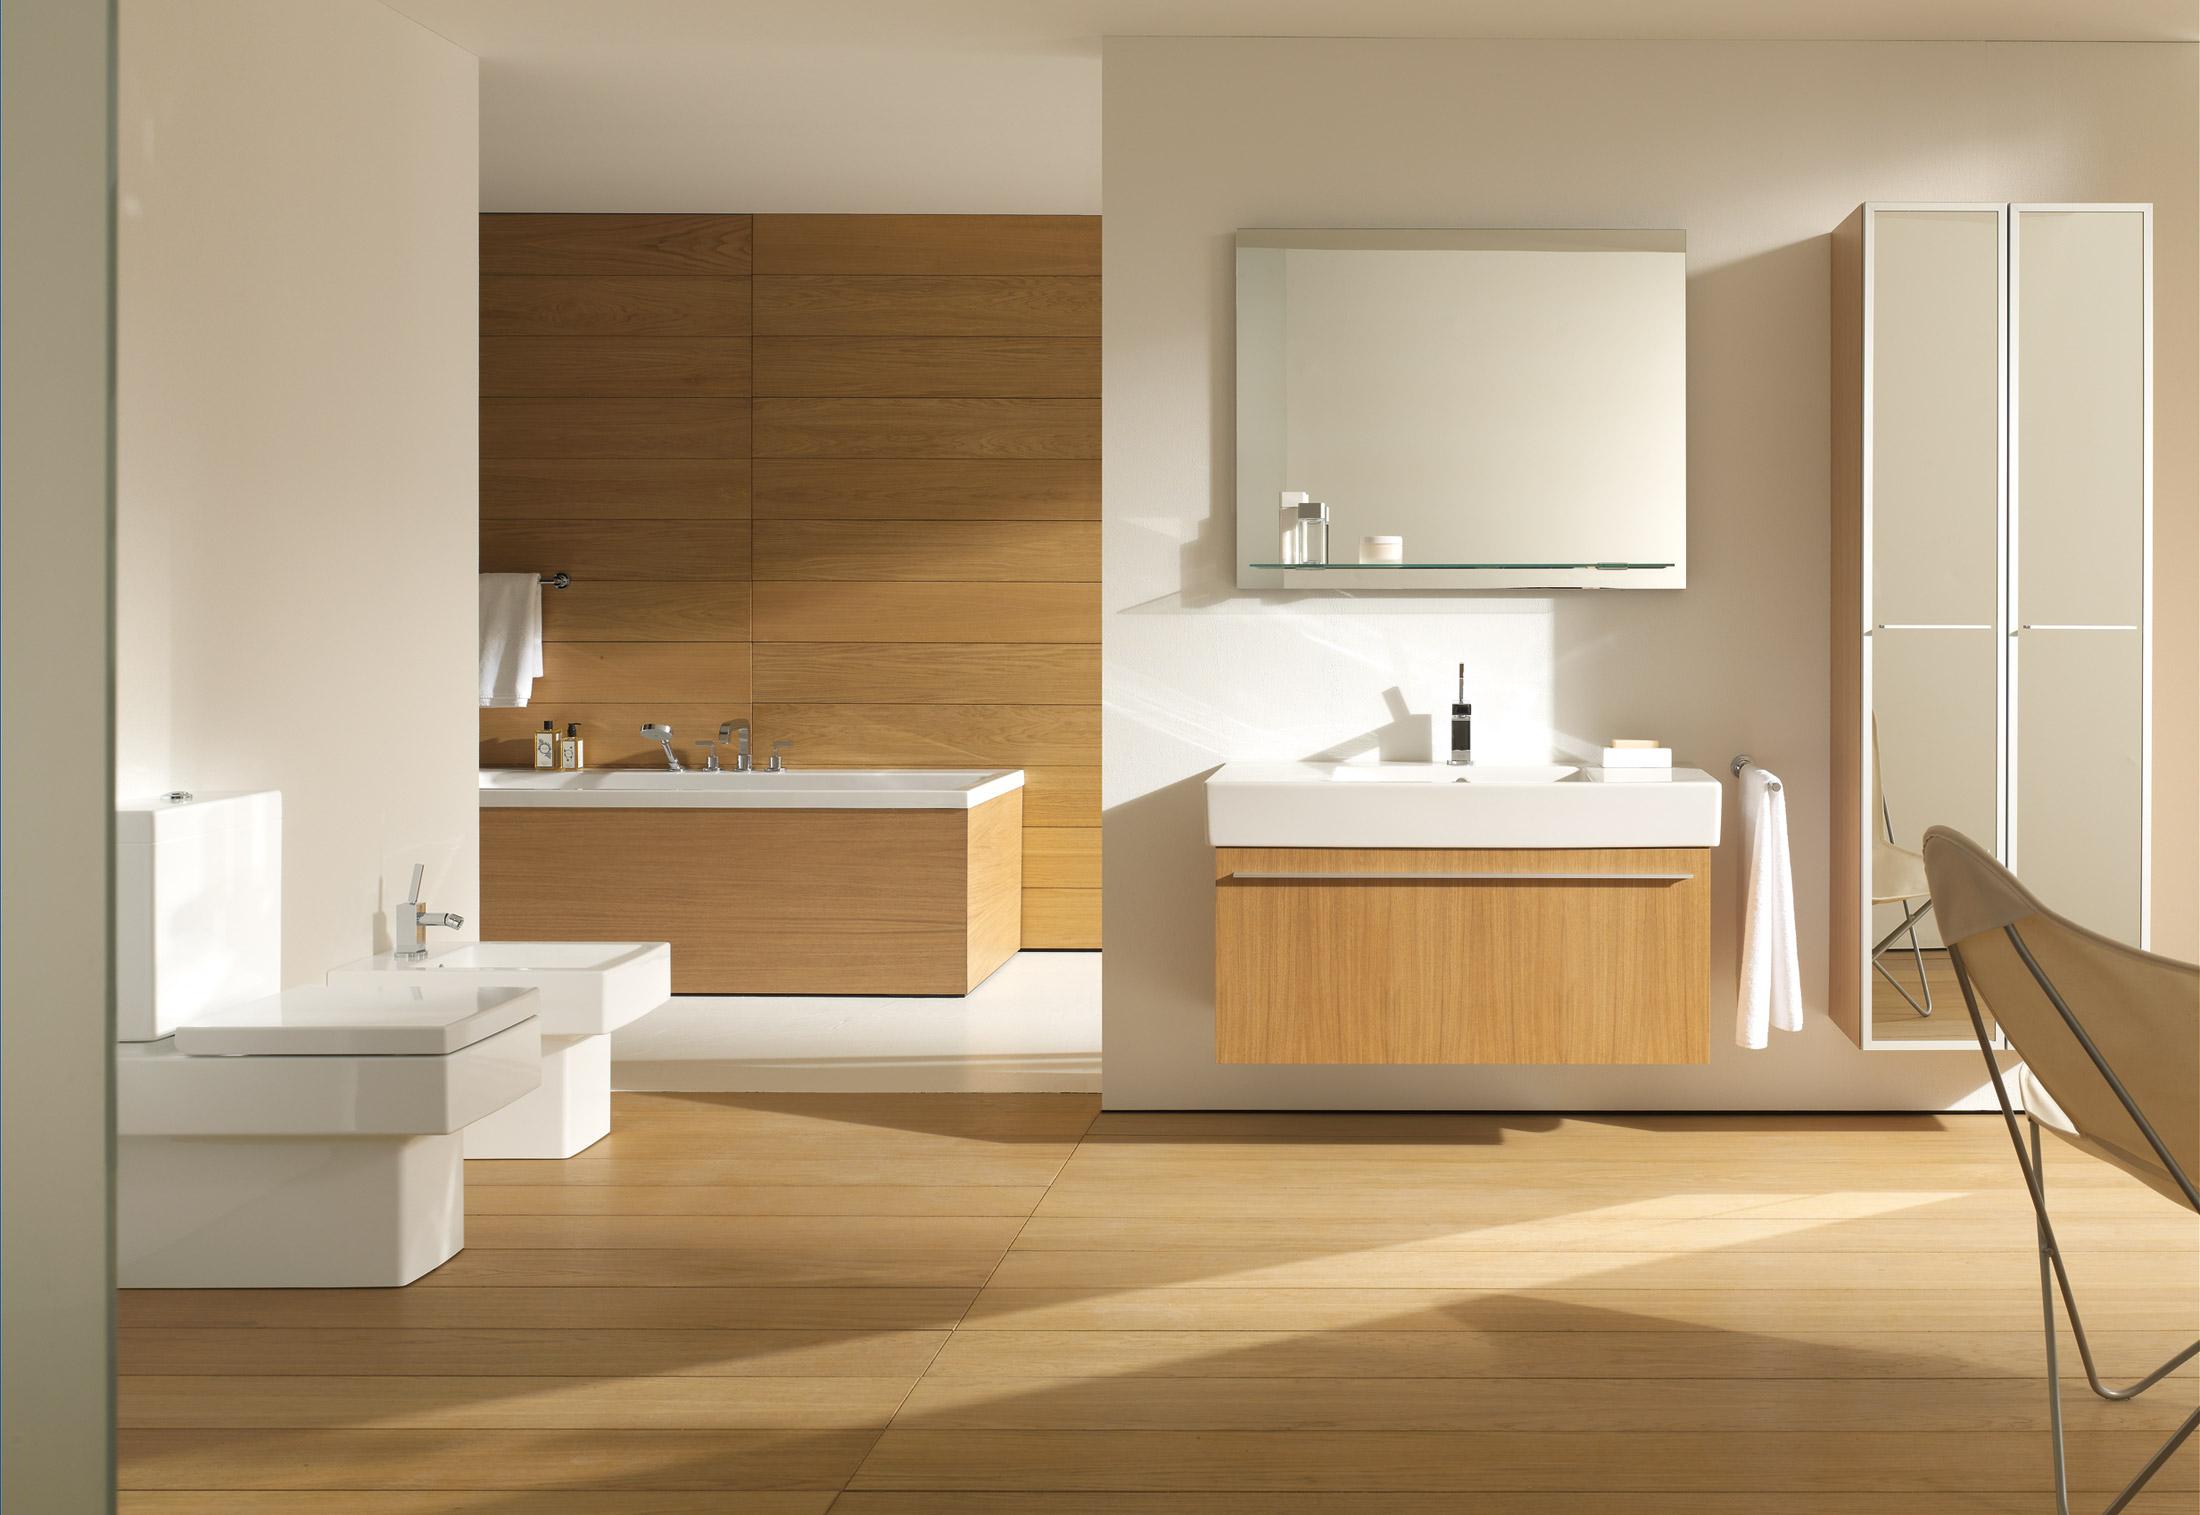 Vero stand wc by duravit stylepark - Sechoir salle de bain mural ...